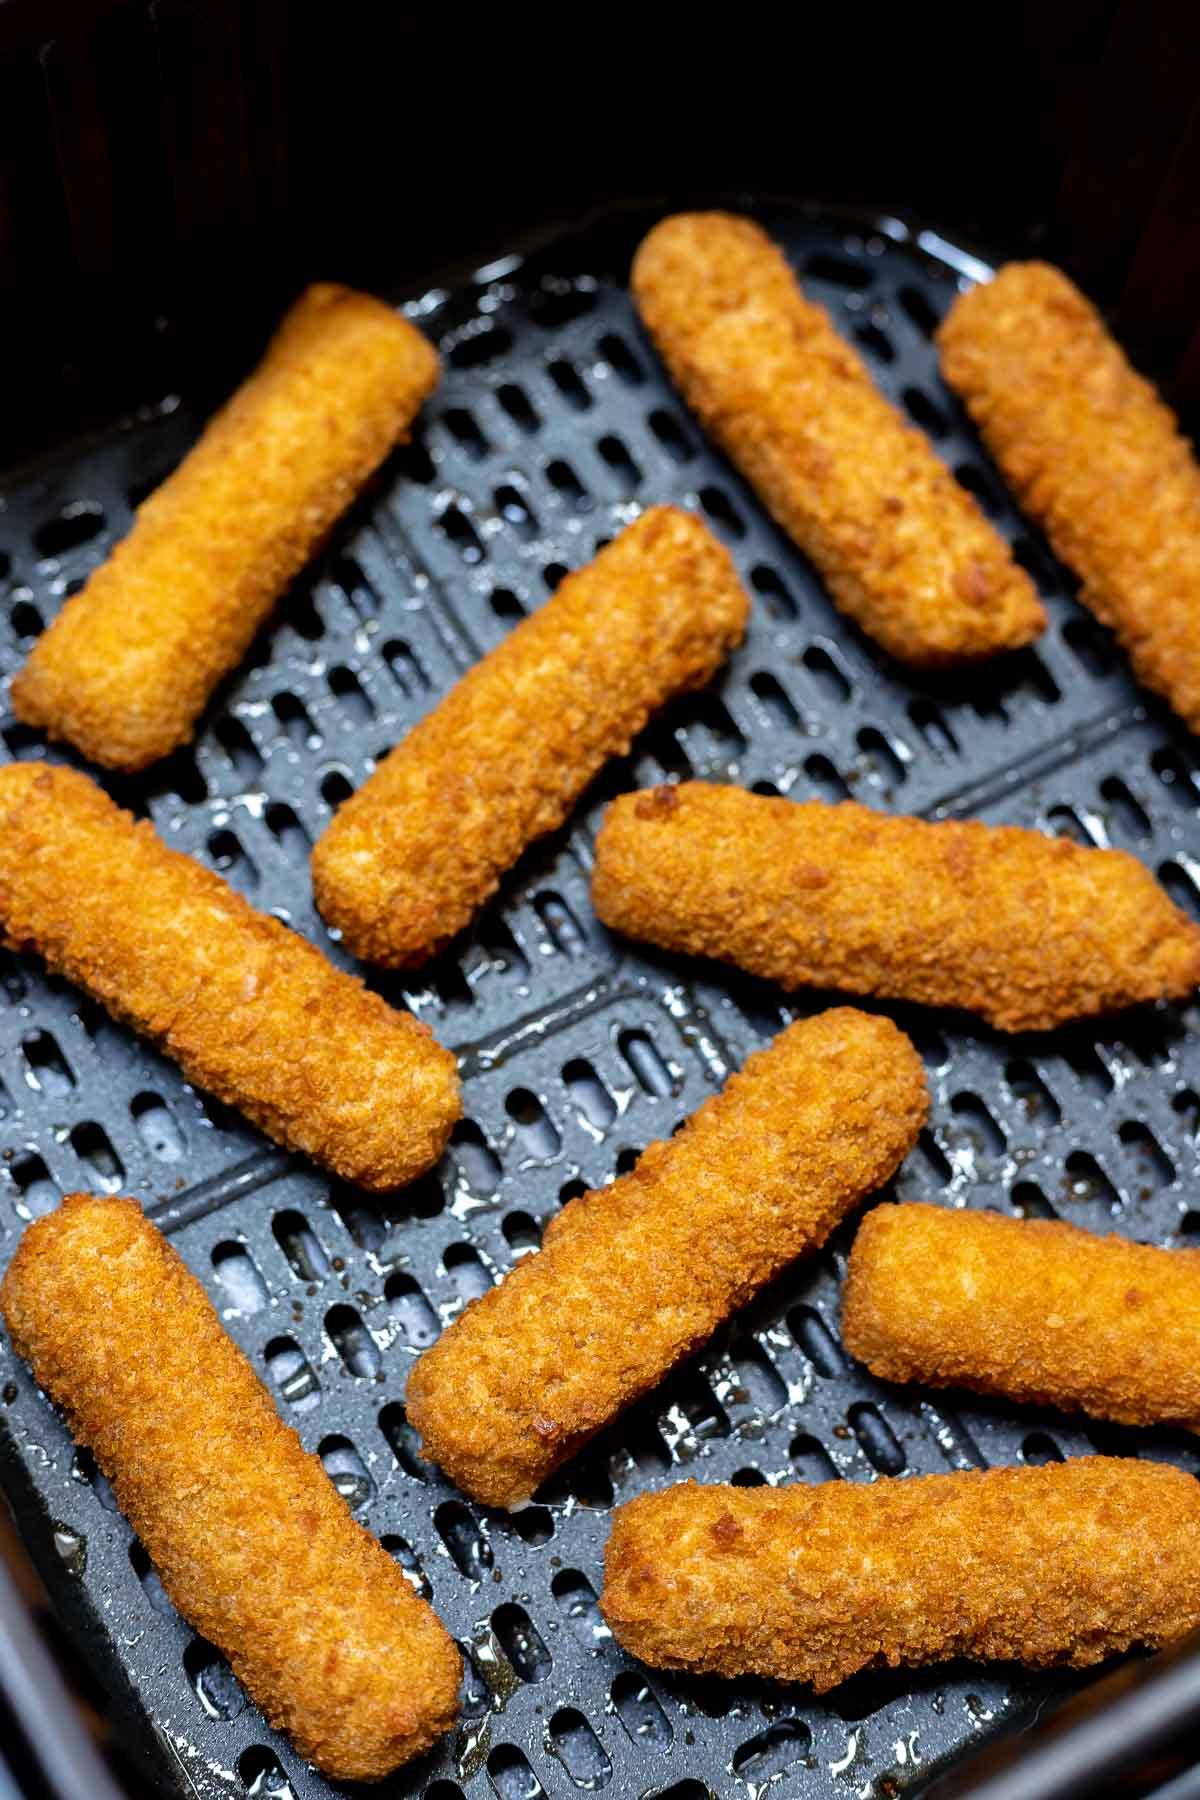 cooked mozzarella cheese sticks in air fryer basket